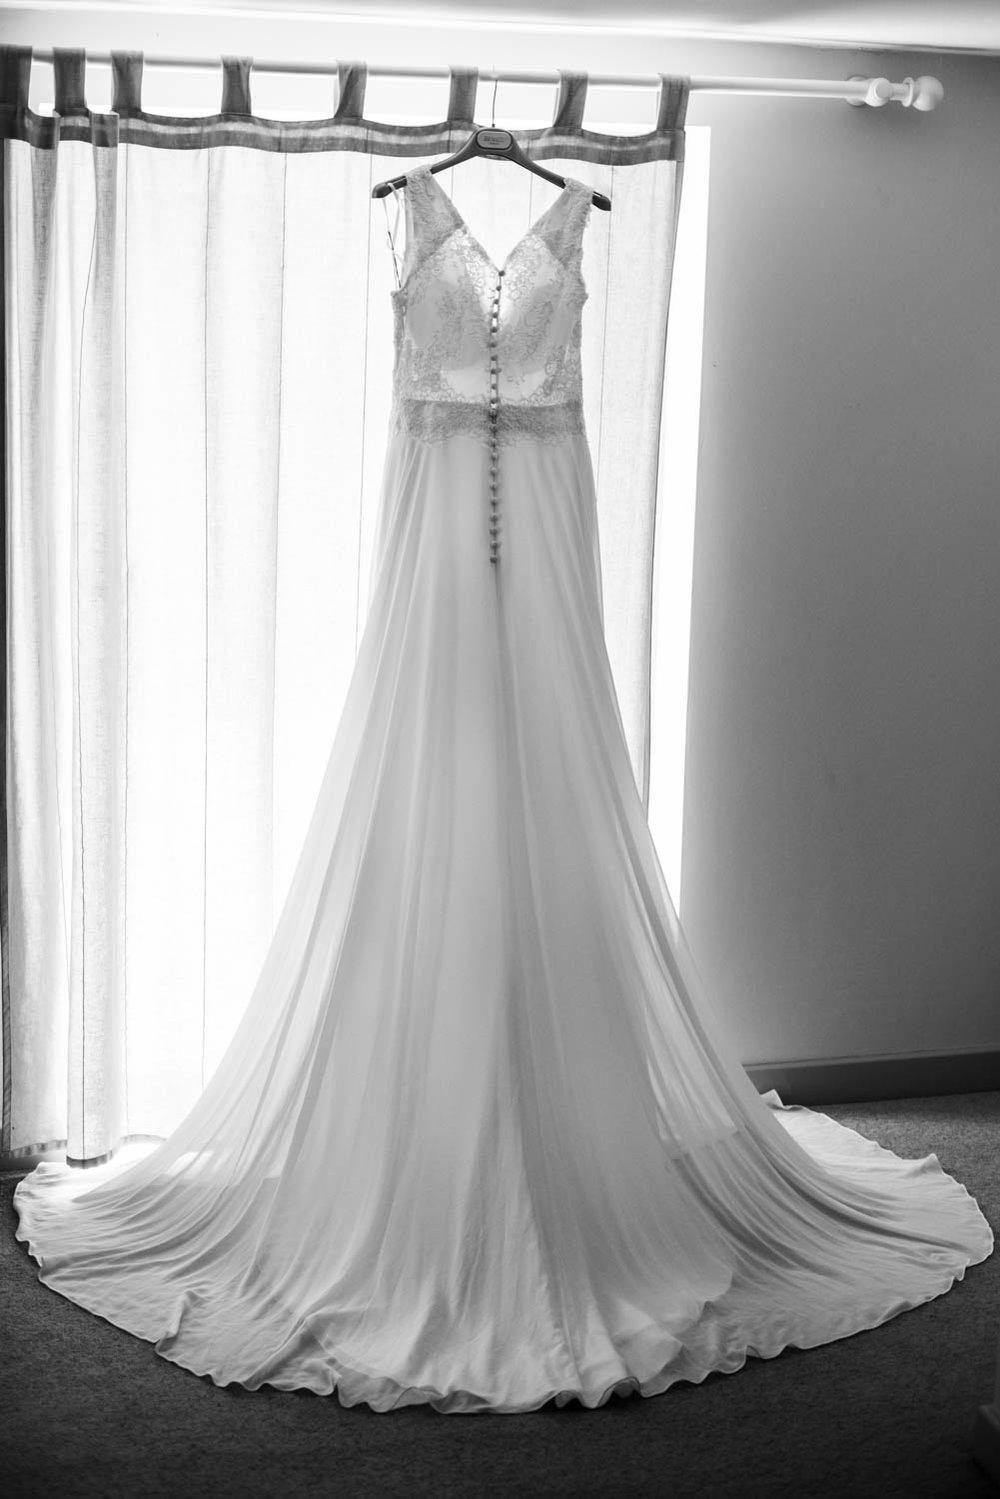 sopley-mill-wedding-phototography-7.jpg